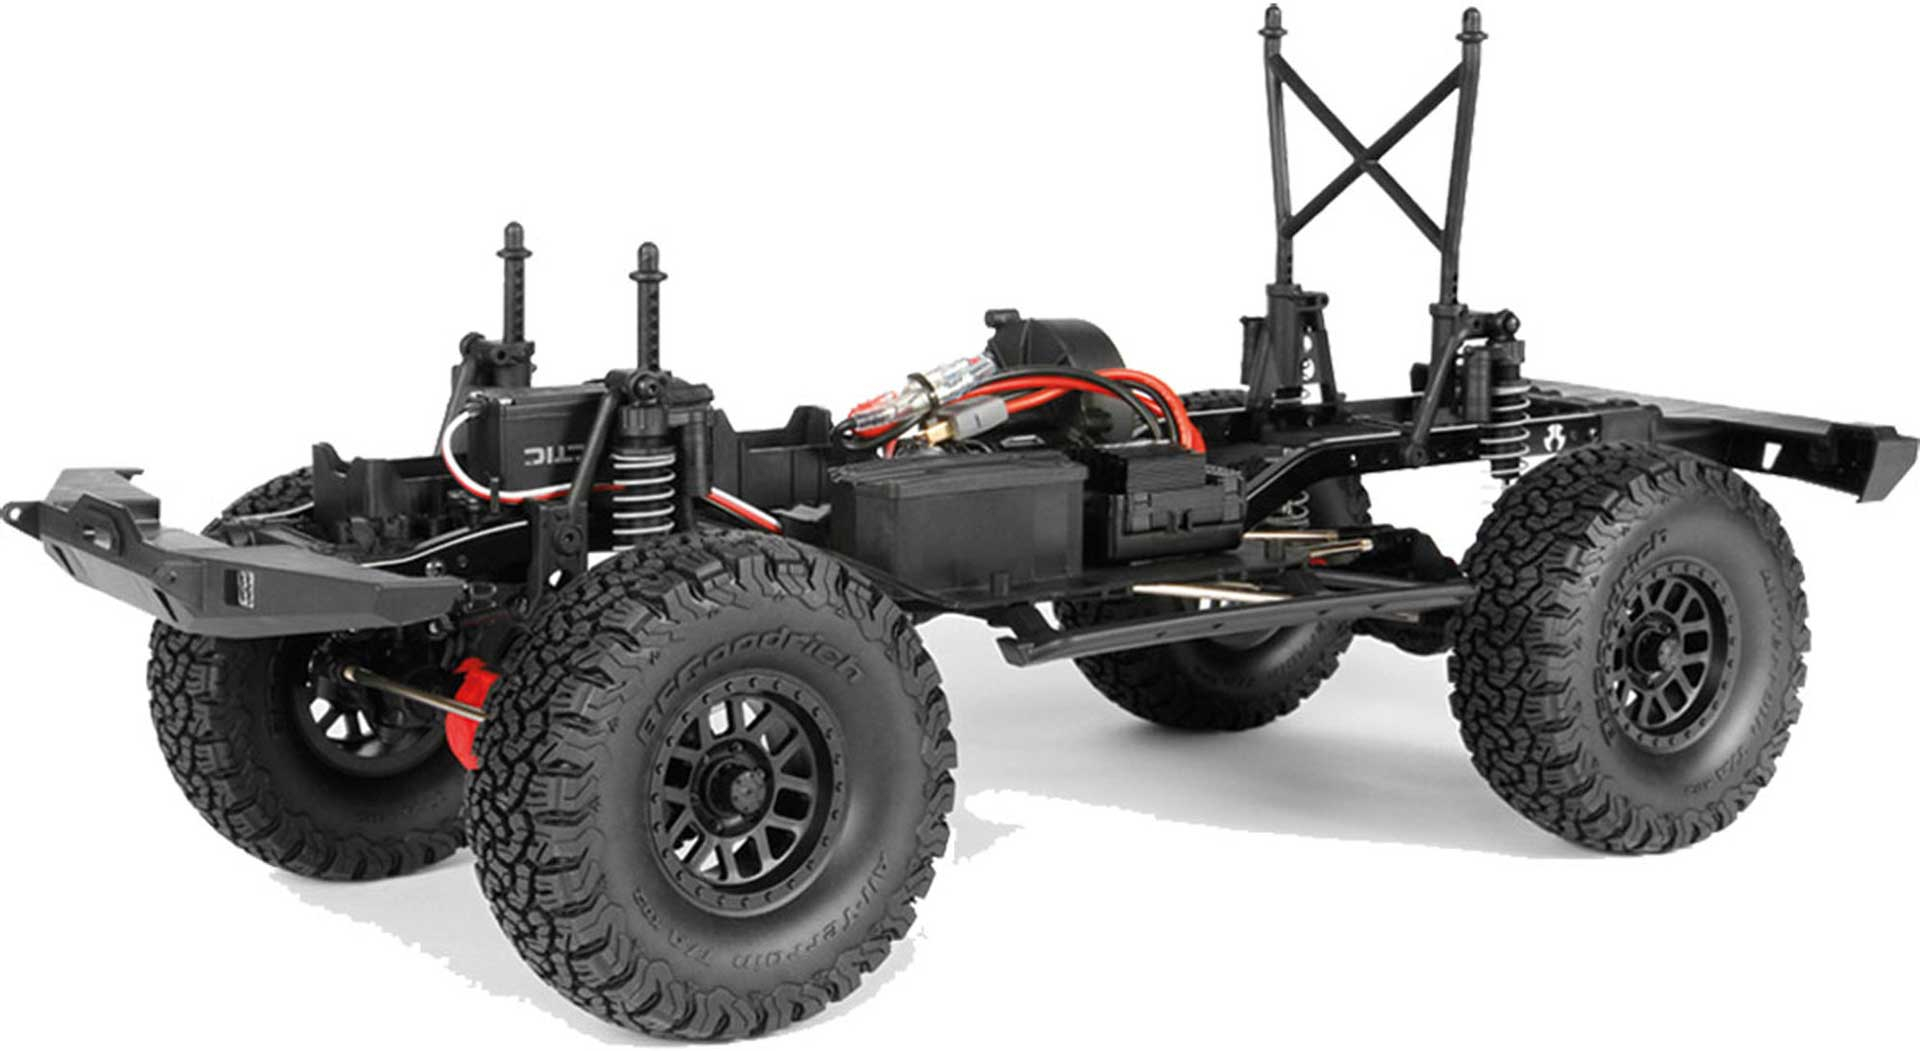 AXIAL JEEP CHEROKEE SCX10 II 4WD 1/10 RTR